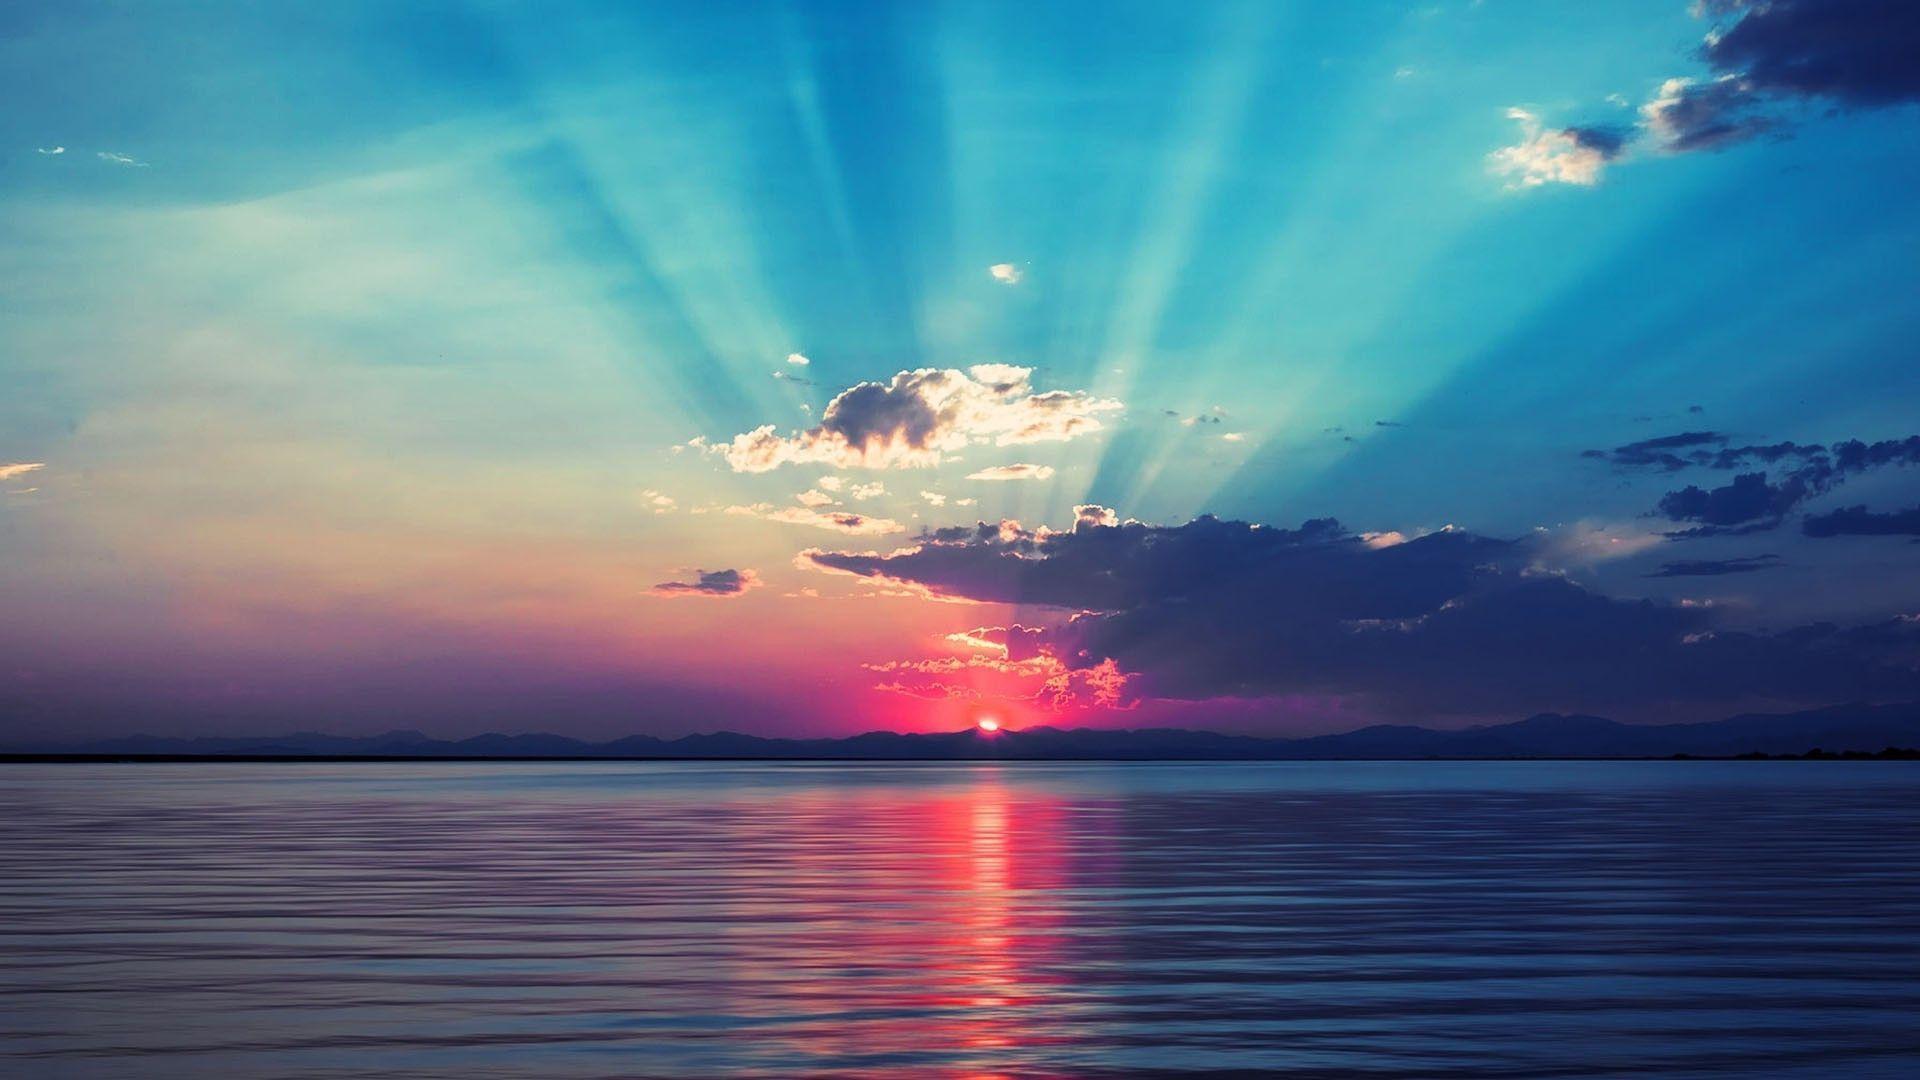 Sunrise Sky Wallpaper Hd Widescreen 11 HD Wallpapers   Eakai.